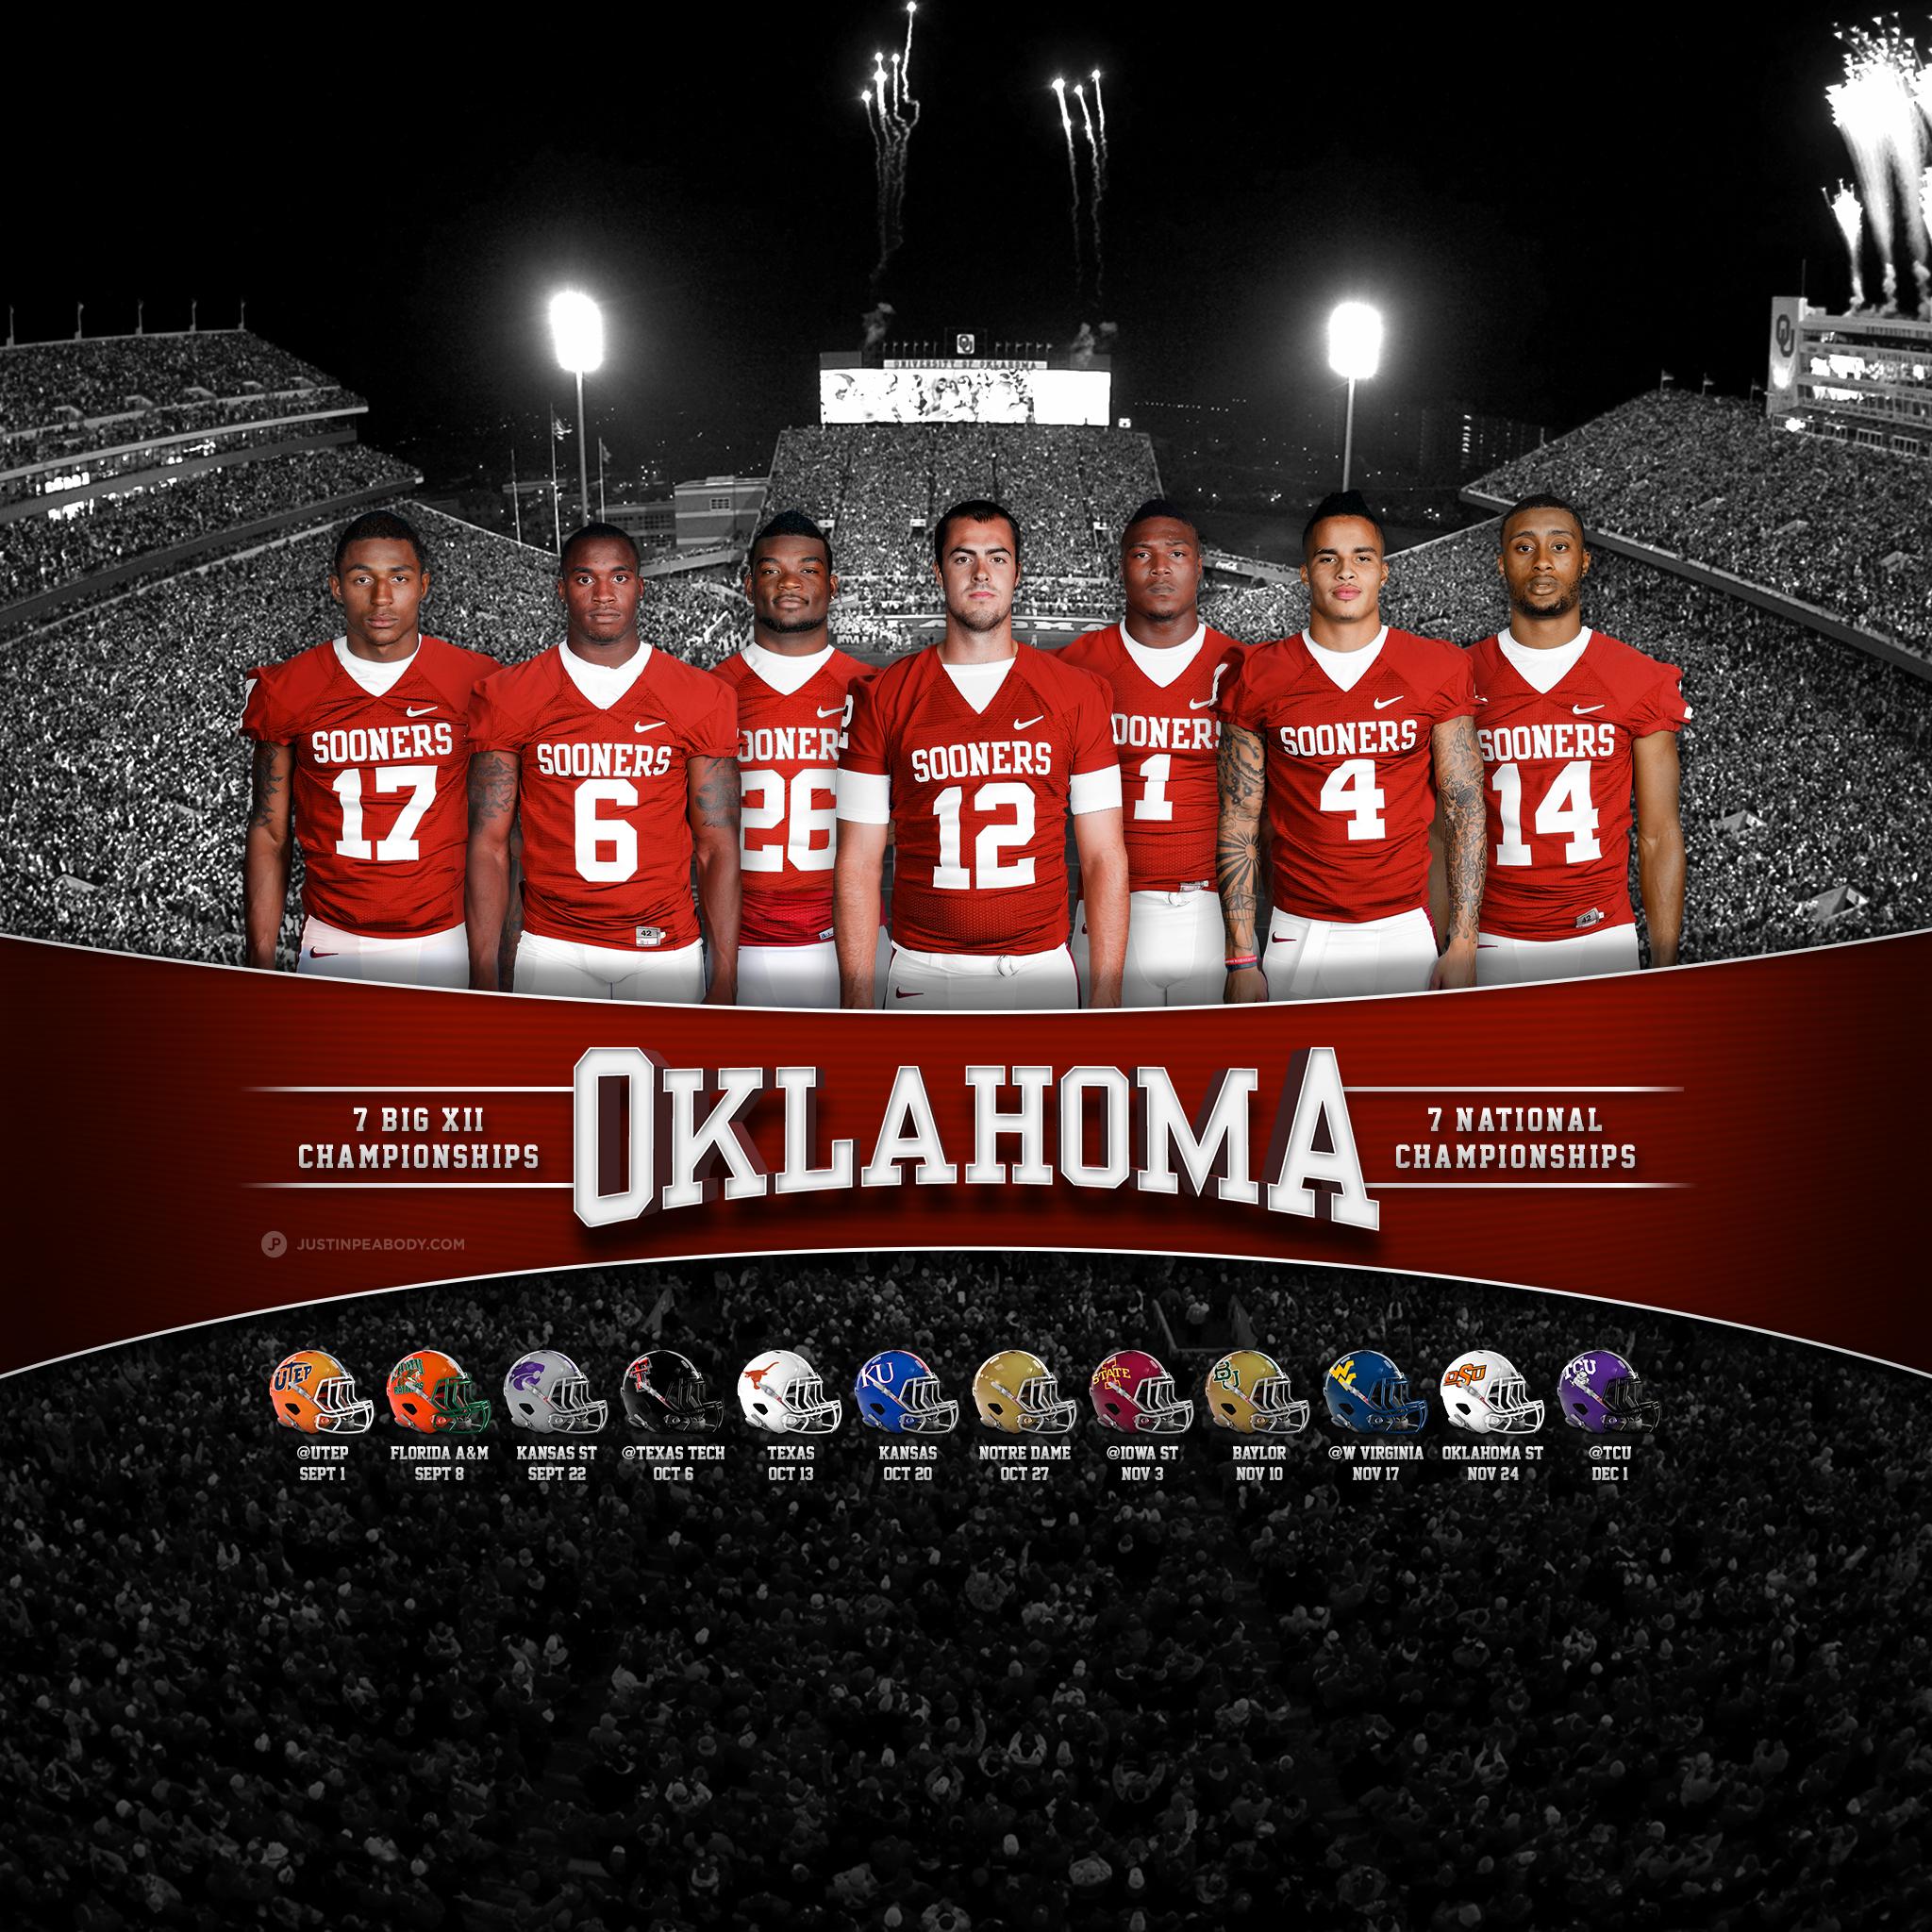 Oklahoma Sooners Football Wallpaper 2013 Ou 12 ipadjpgdisposition 2048x2048